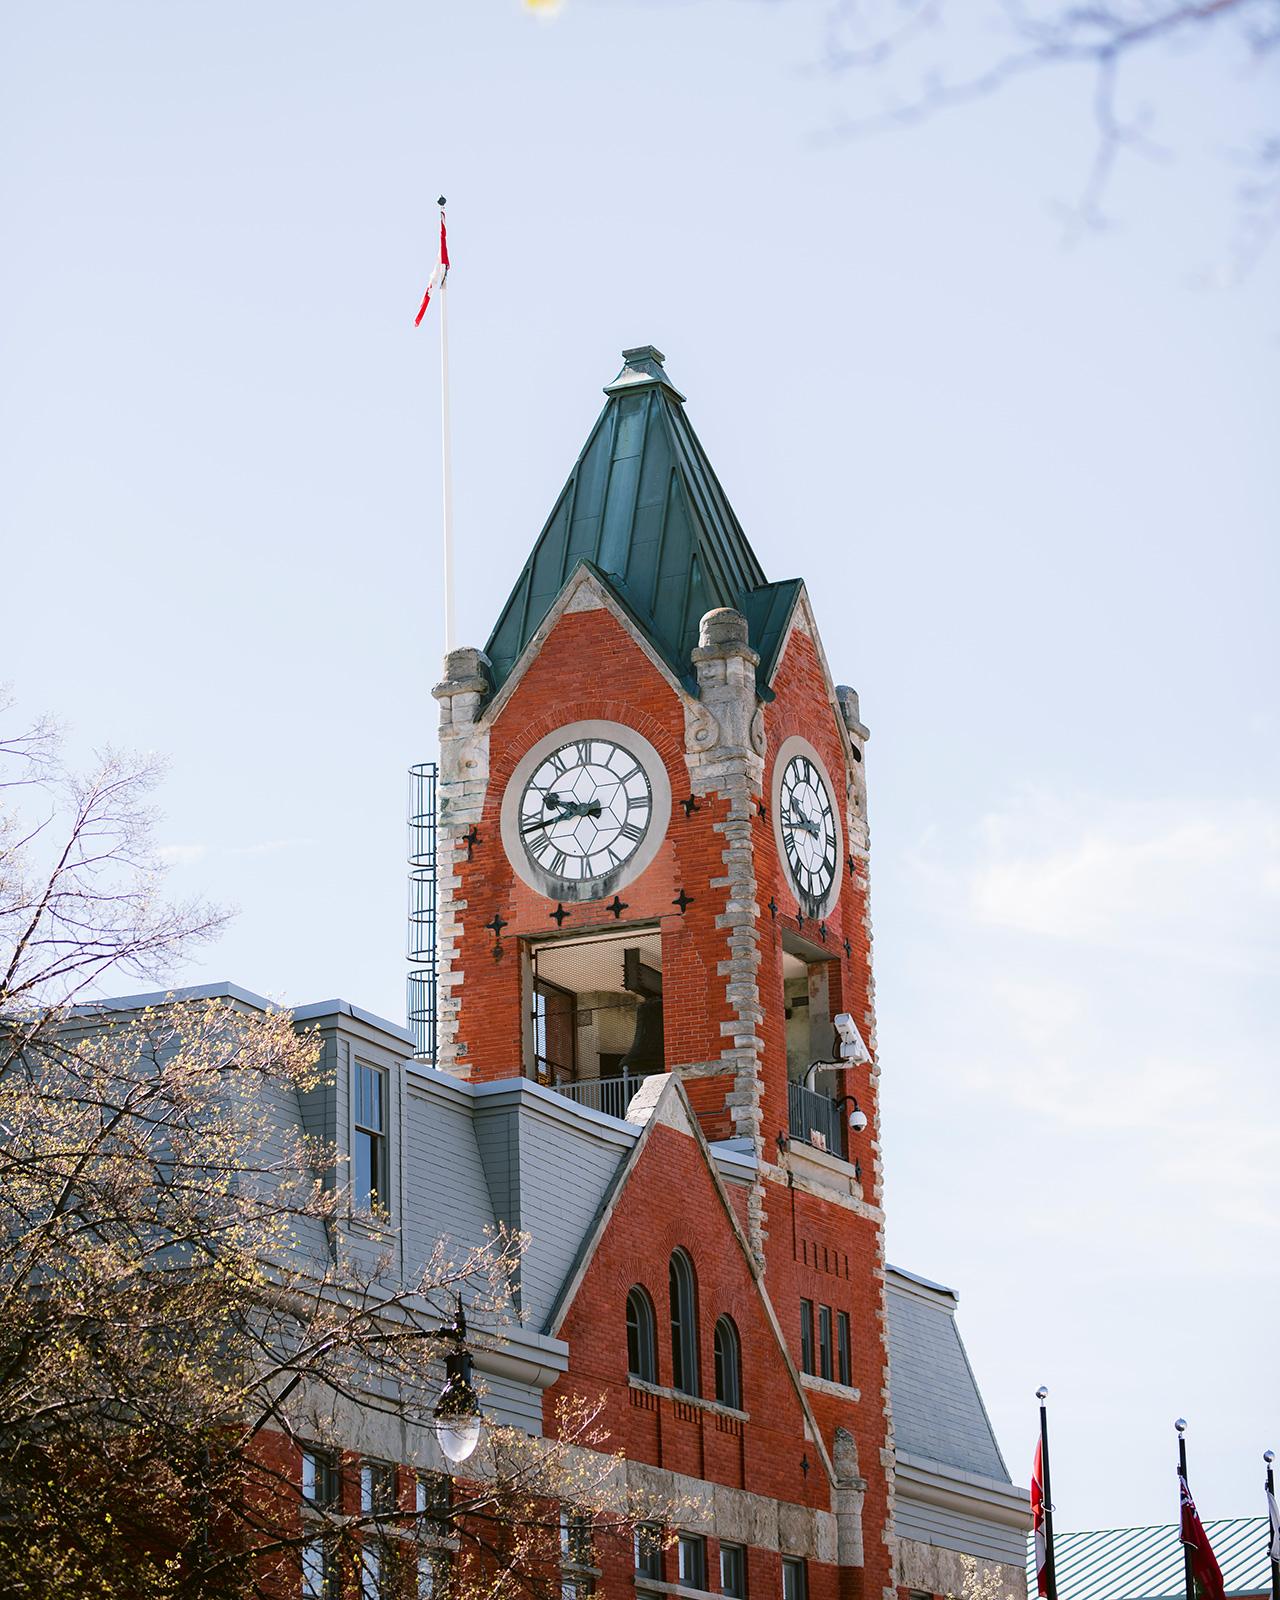 Collingwood town Hall